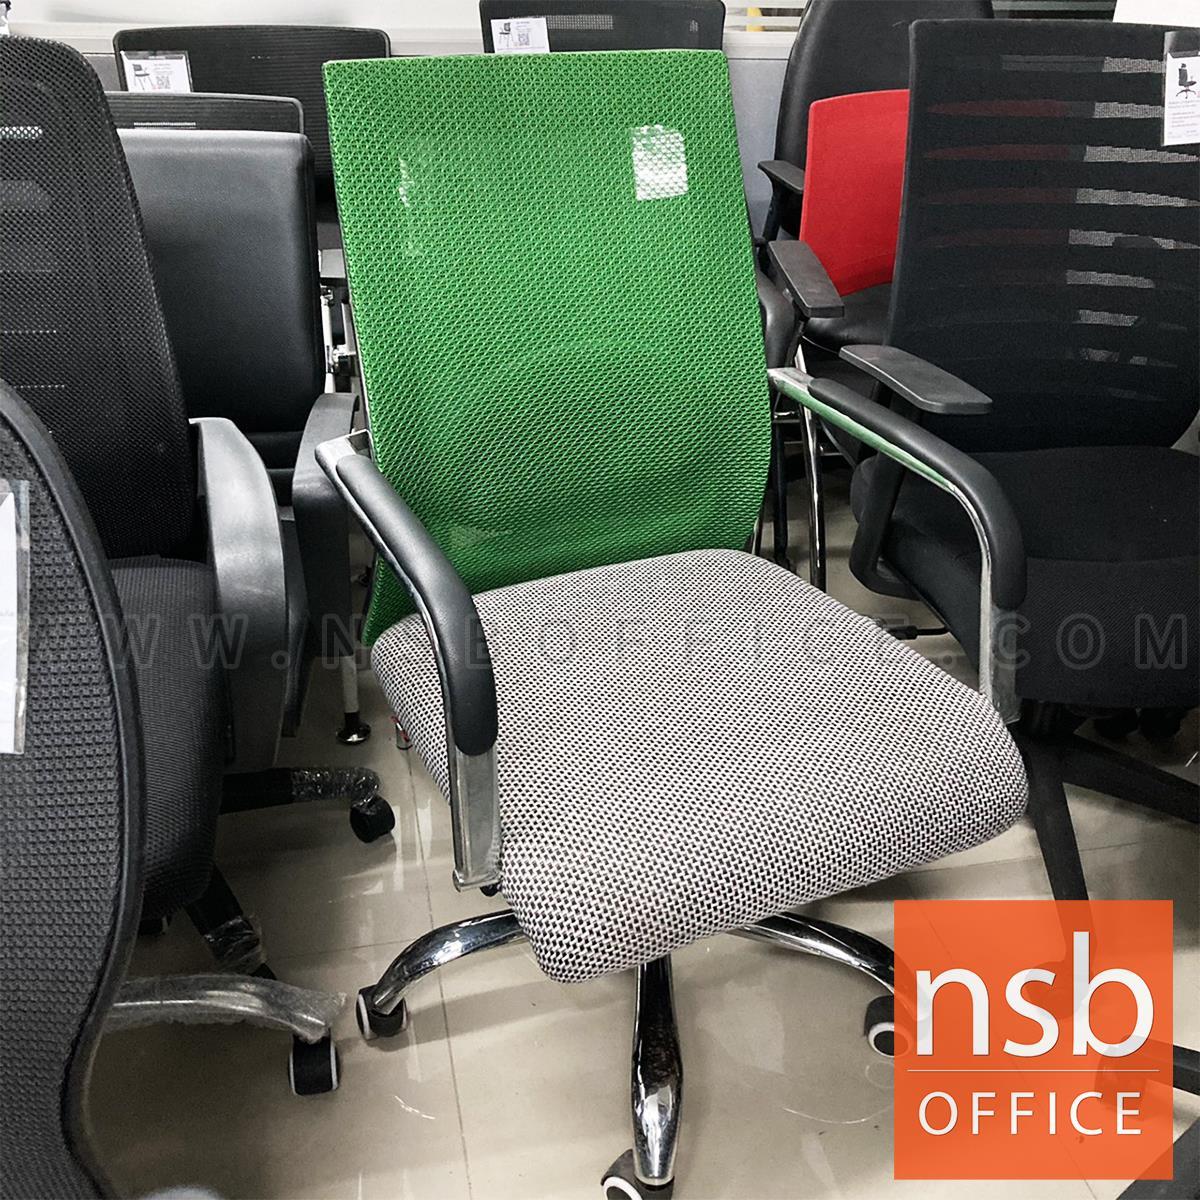 L02A382:เก้าอี้สำนักงานหลังเน็ต   โช๊คแก๊ส มีก้อนโยก ขาเหล็กชุบโครเมี่ยม